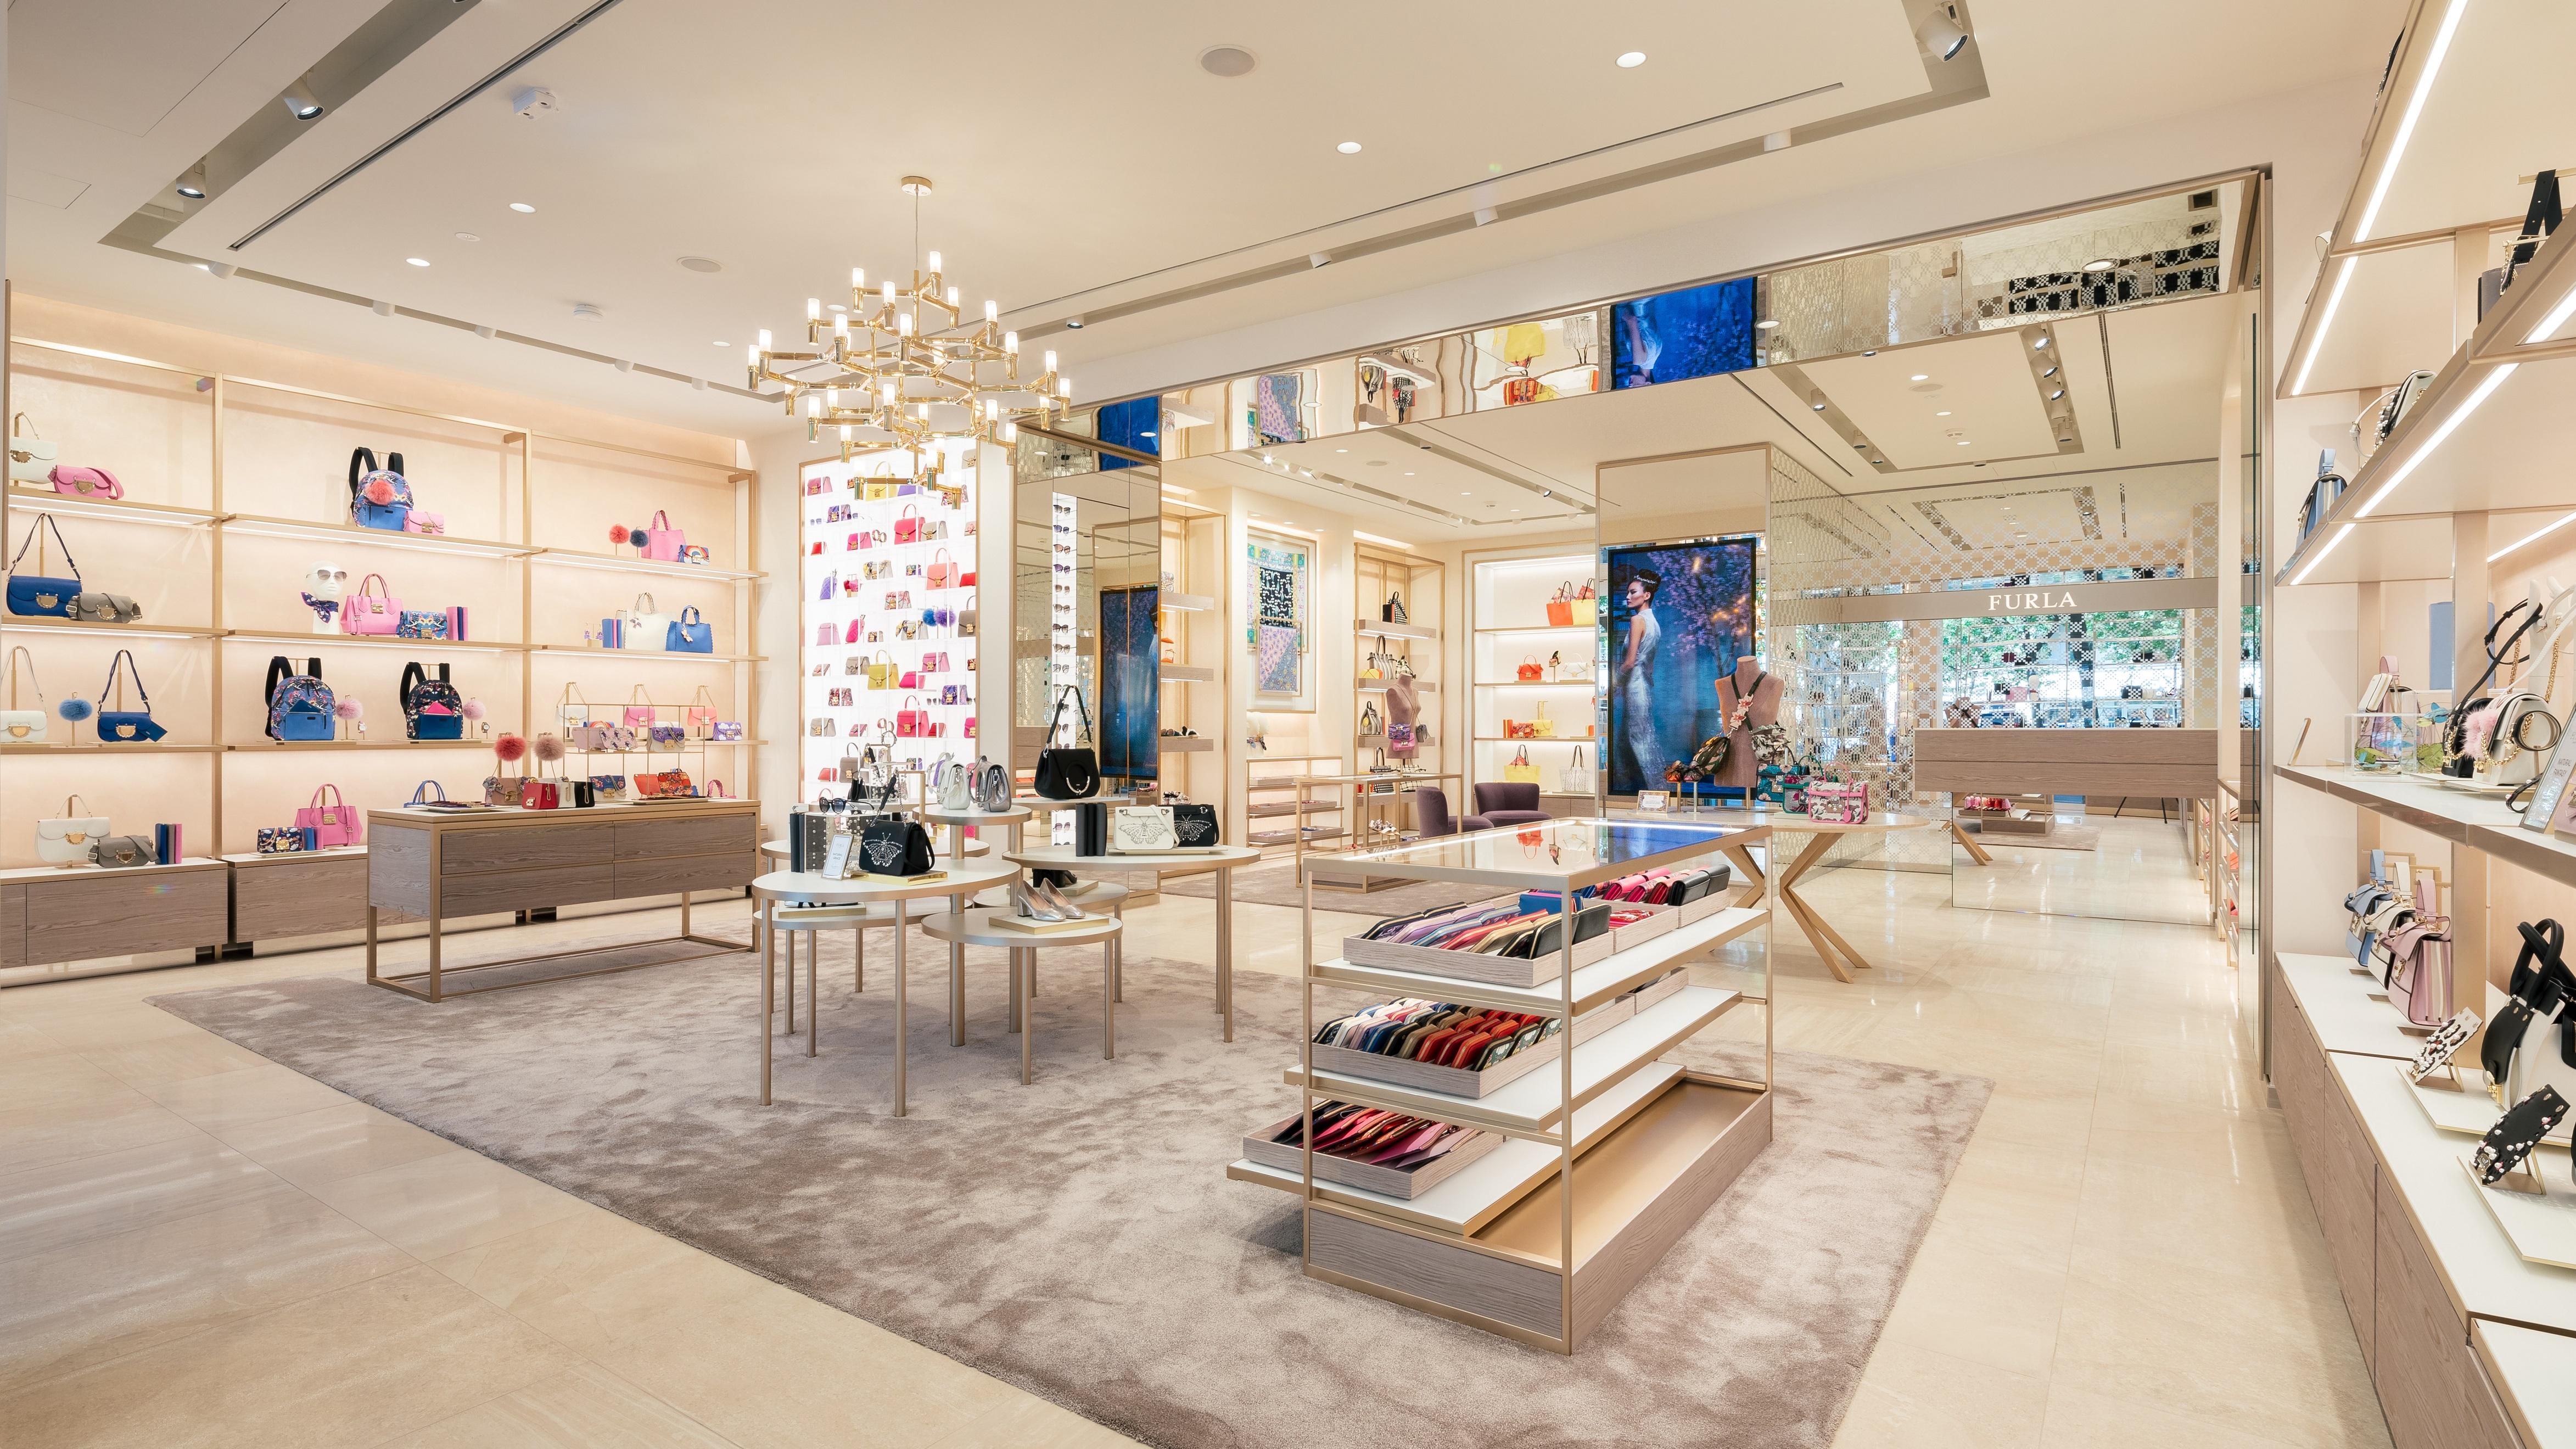 The new Furla Store in Berlin.